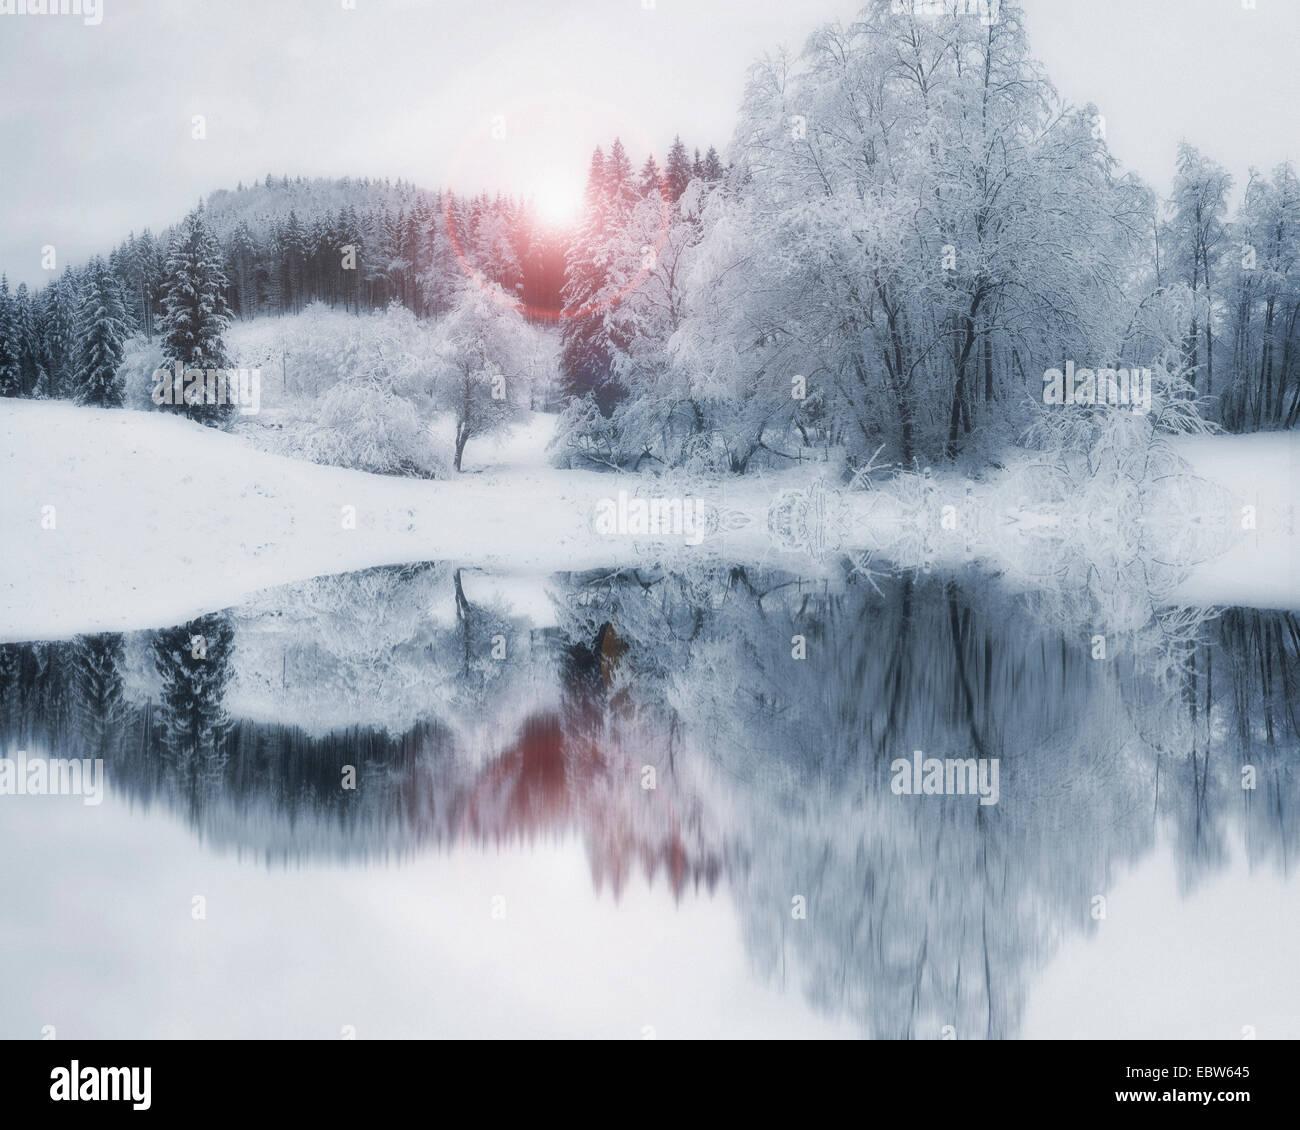 DE - BAVARIA: Winter Wonderland Stock Photo